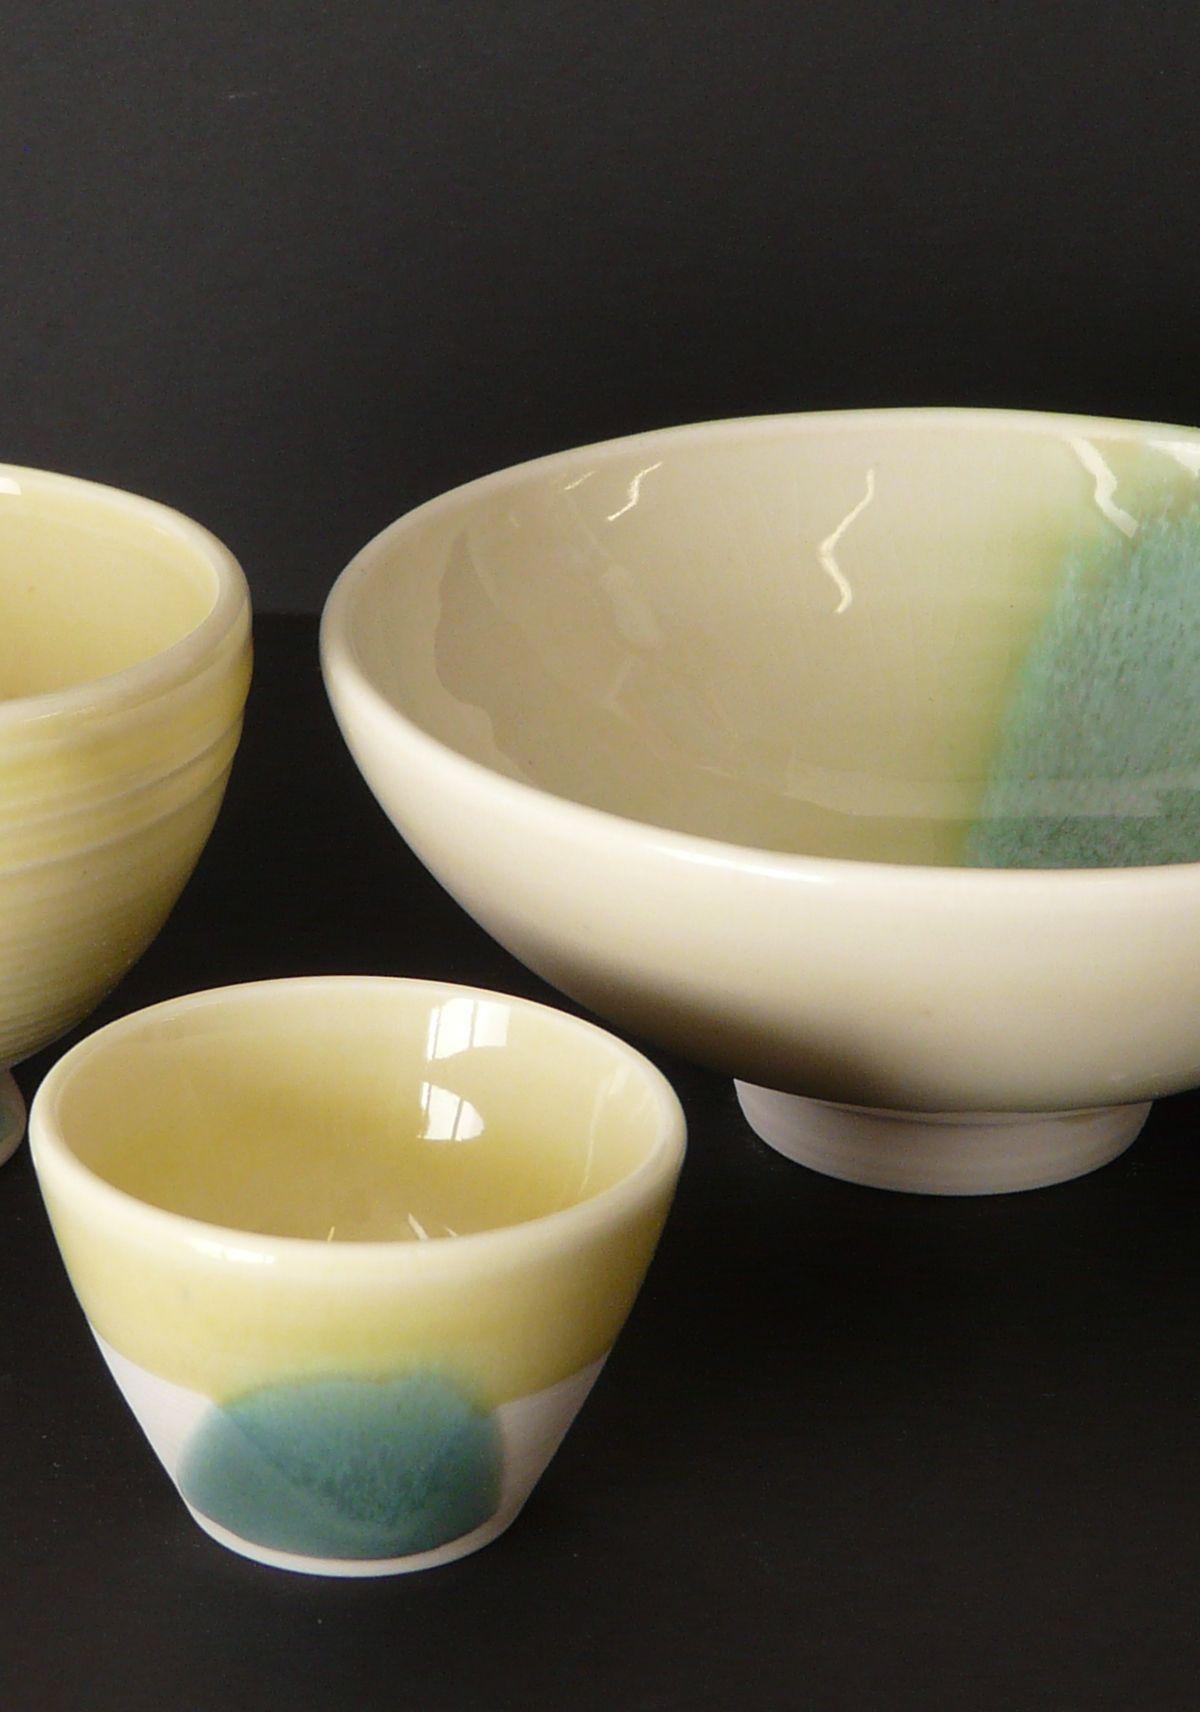 Artesania ceramica de alta temperatura: Porcelana